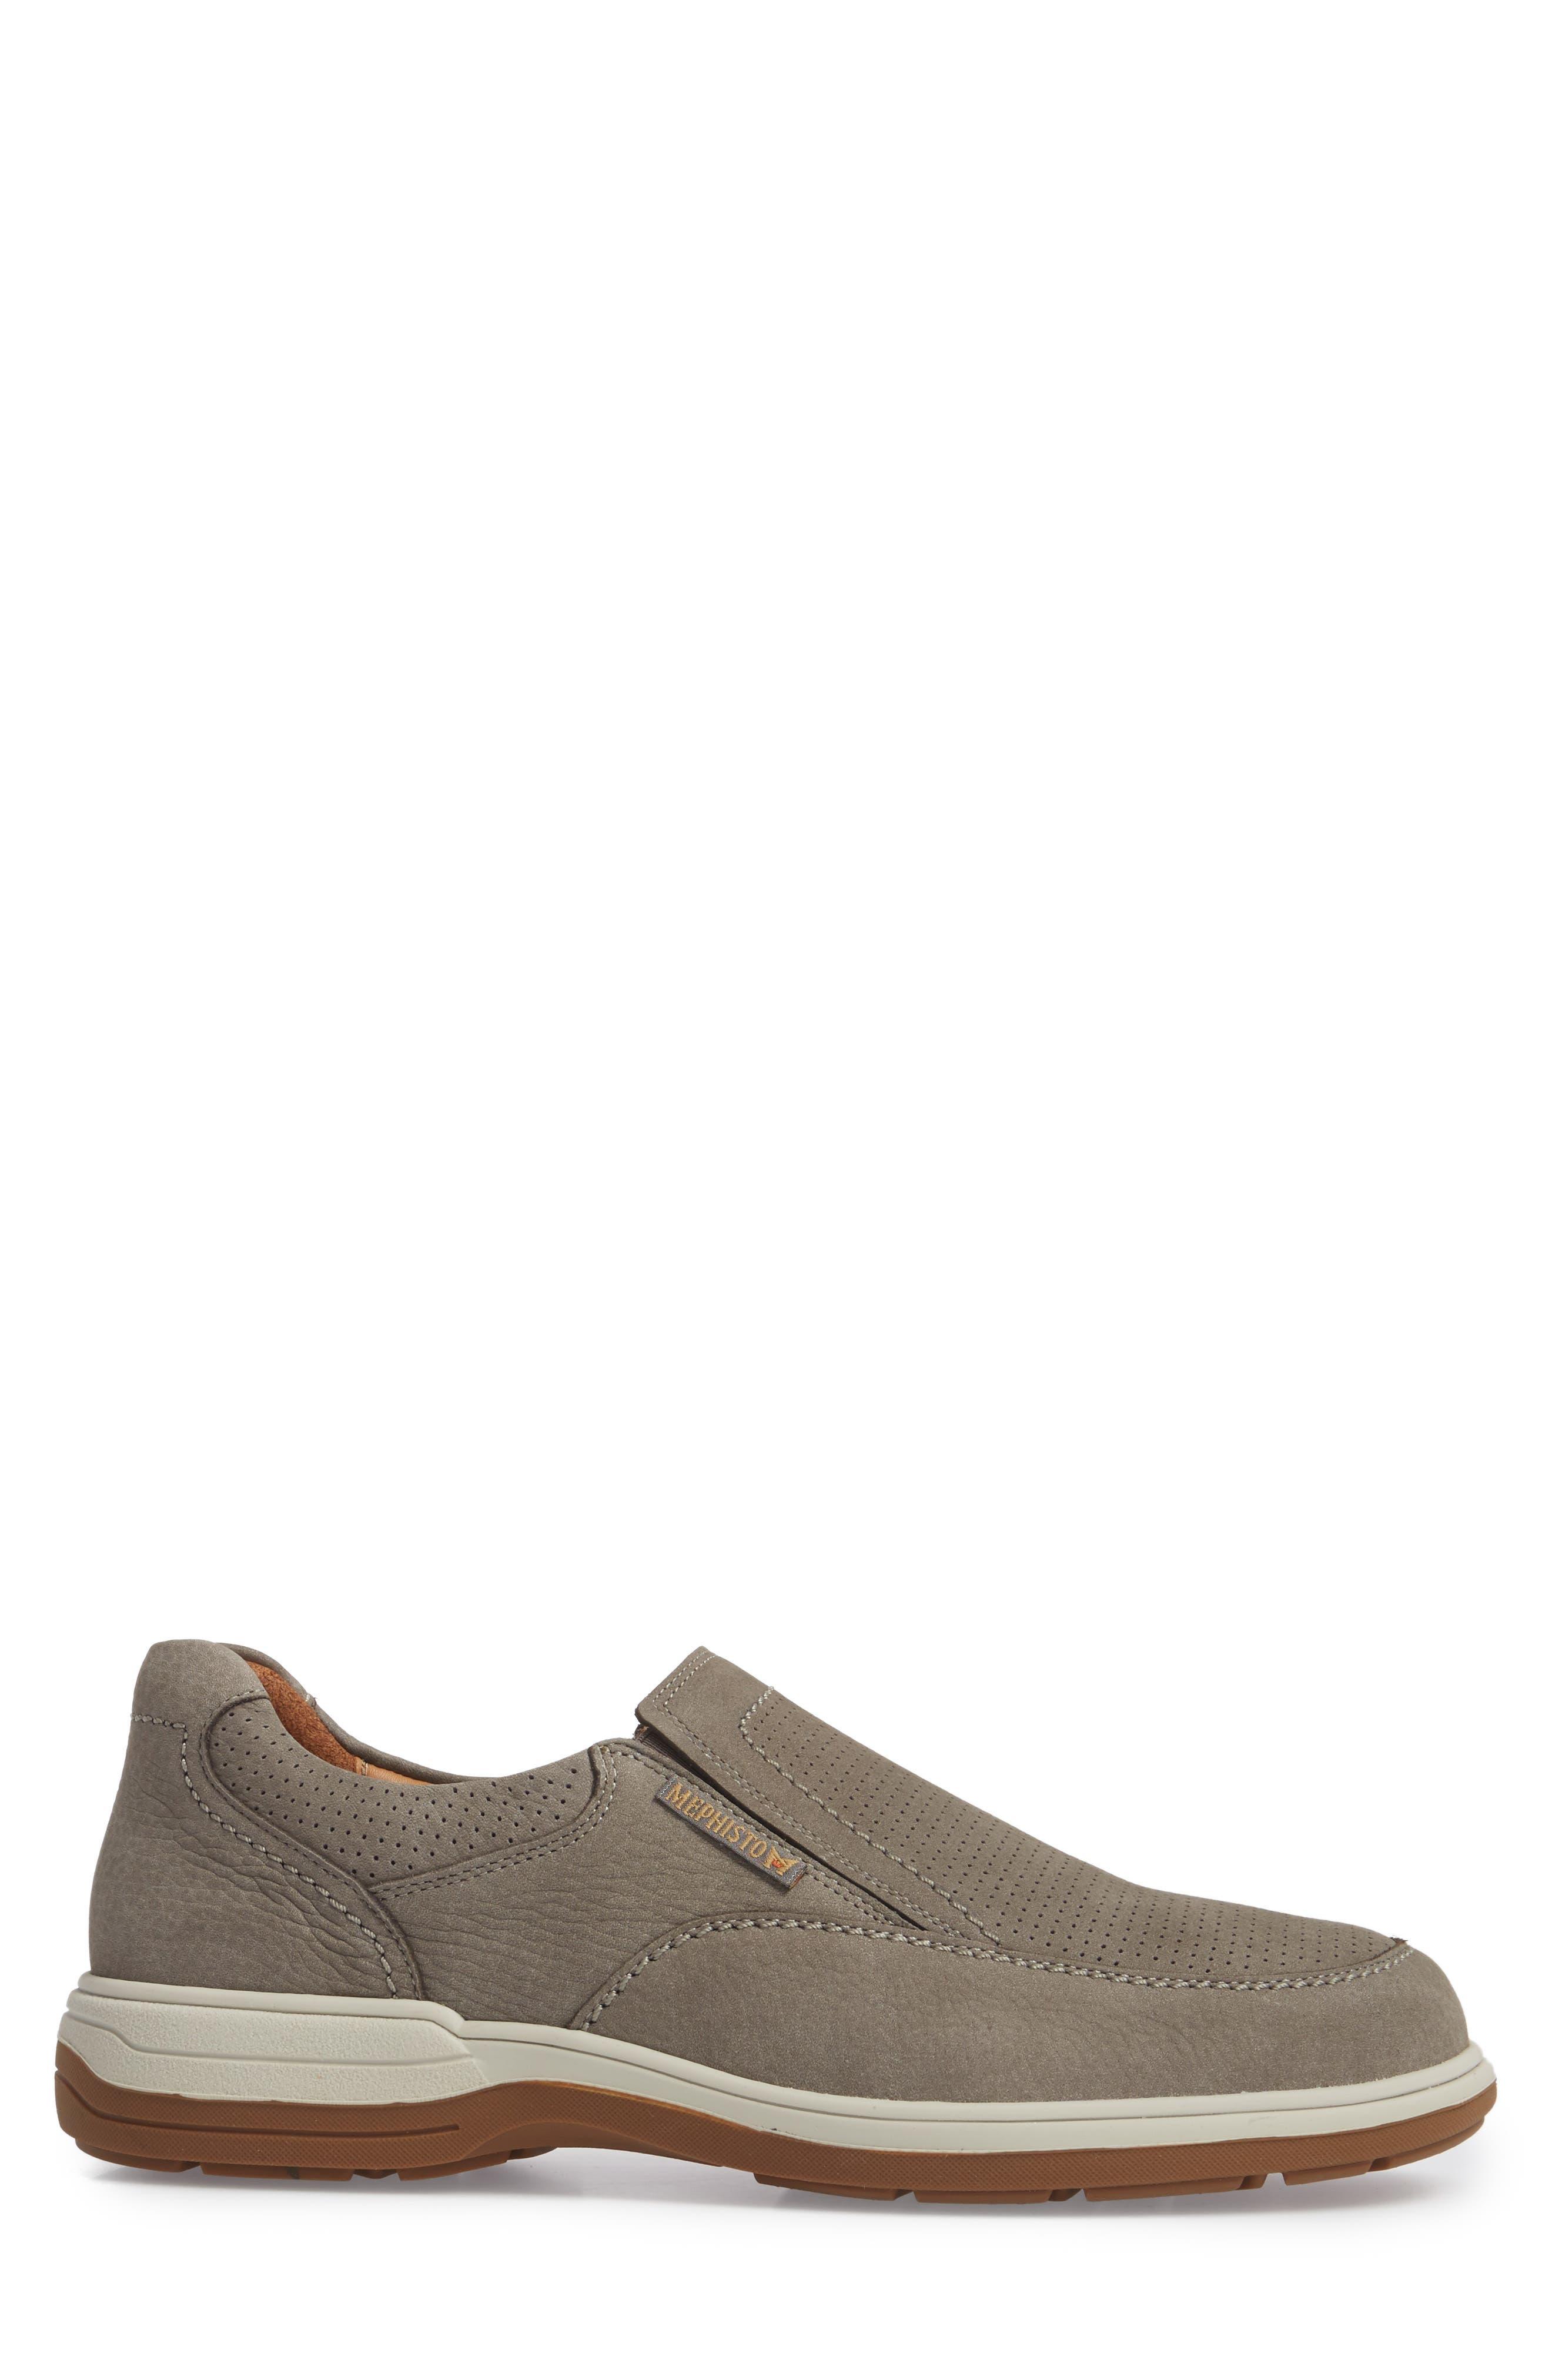 Davy Perforated Slip-On Sneaker,                             Alternate thumbnail 3, color,                             051